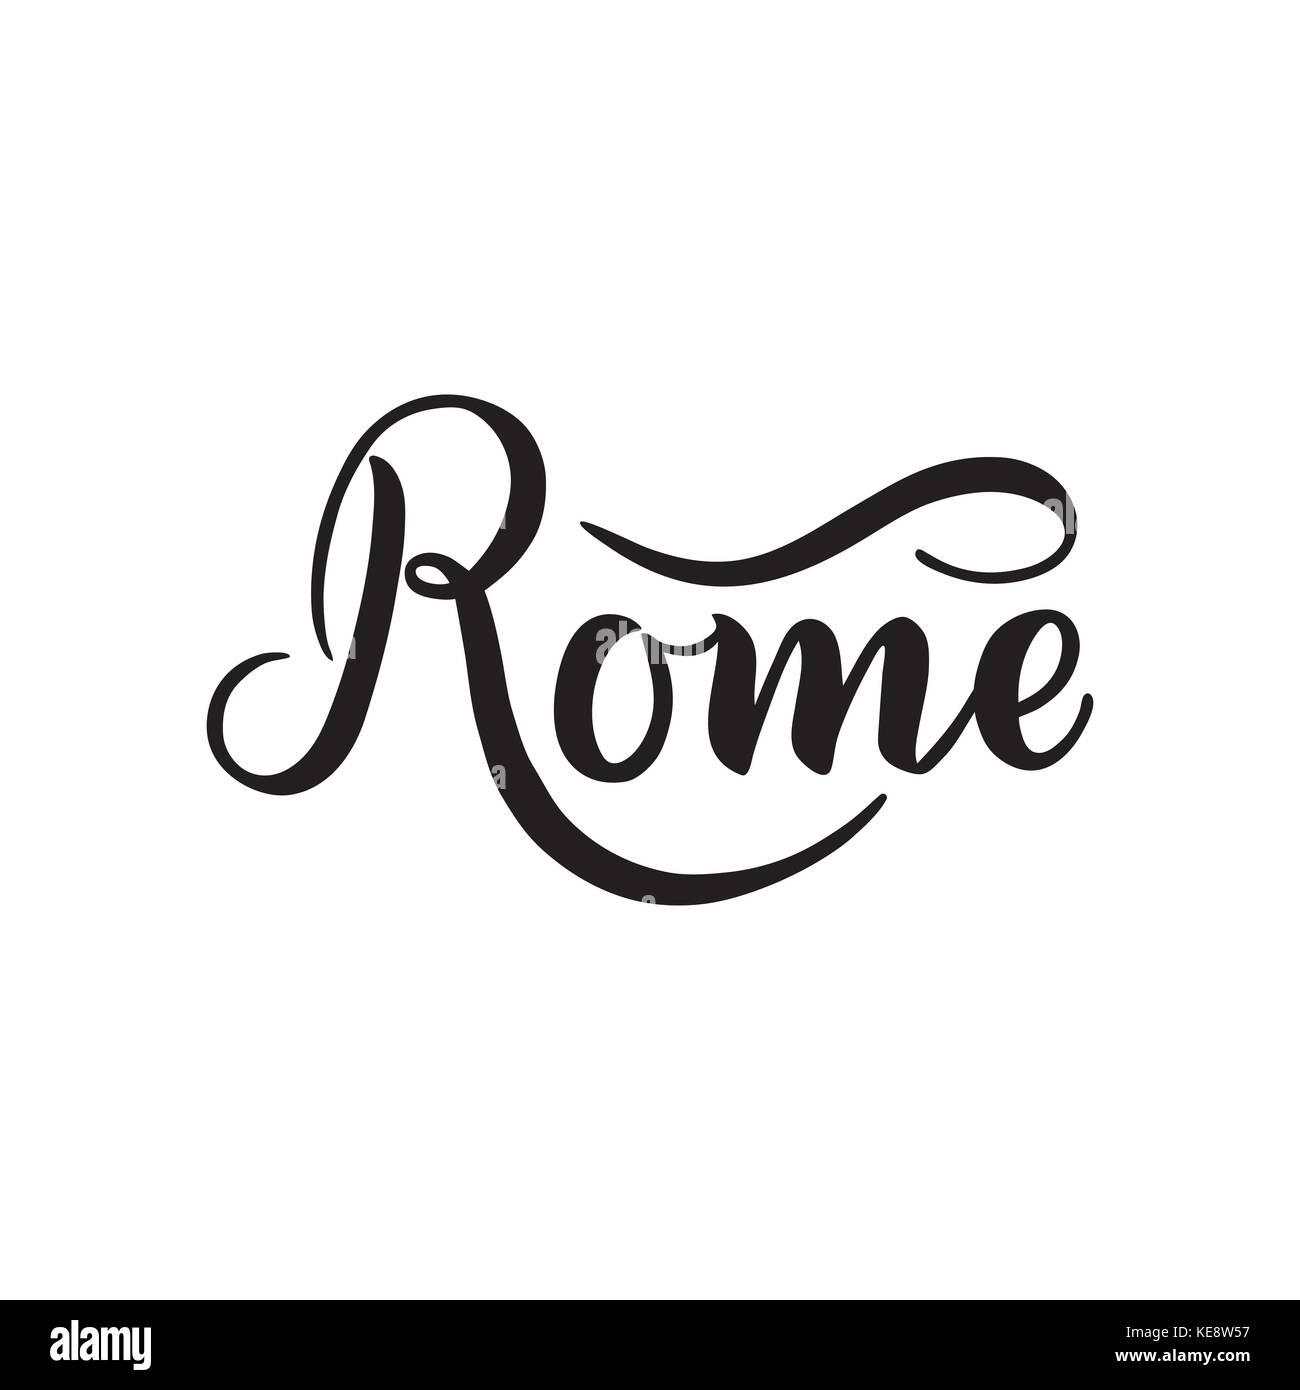 Vintage Travel Poster Italy Stock Photos & Vintage Travel ...